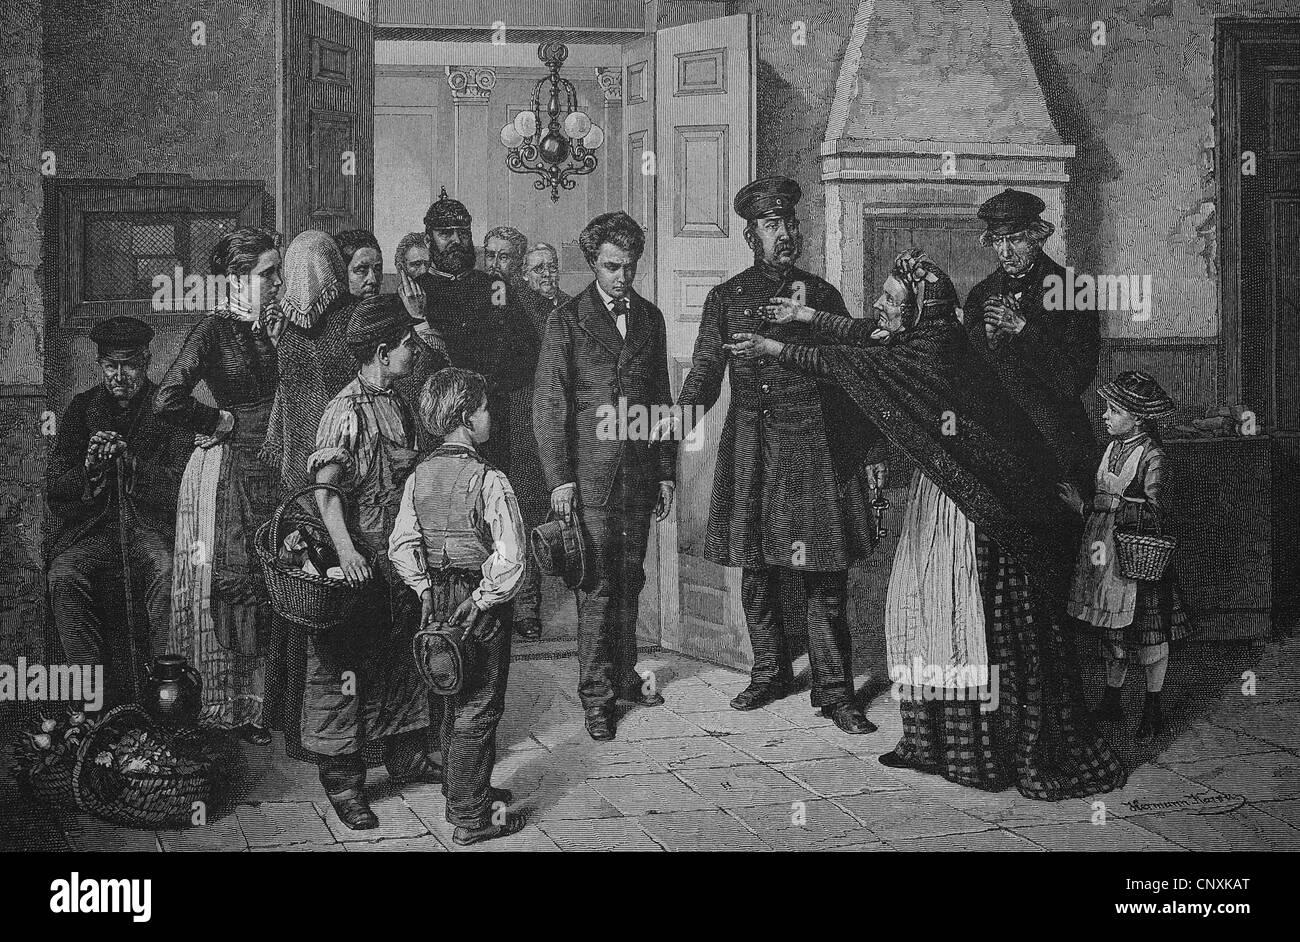 Criminal being captured, historical engraving, 1883 - Stock Image